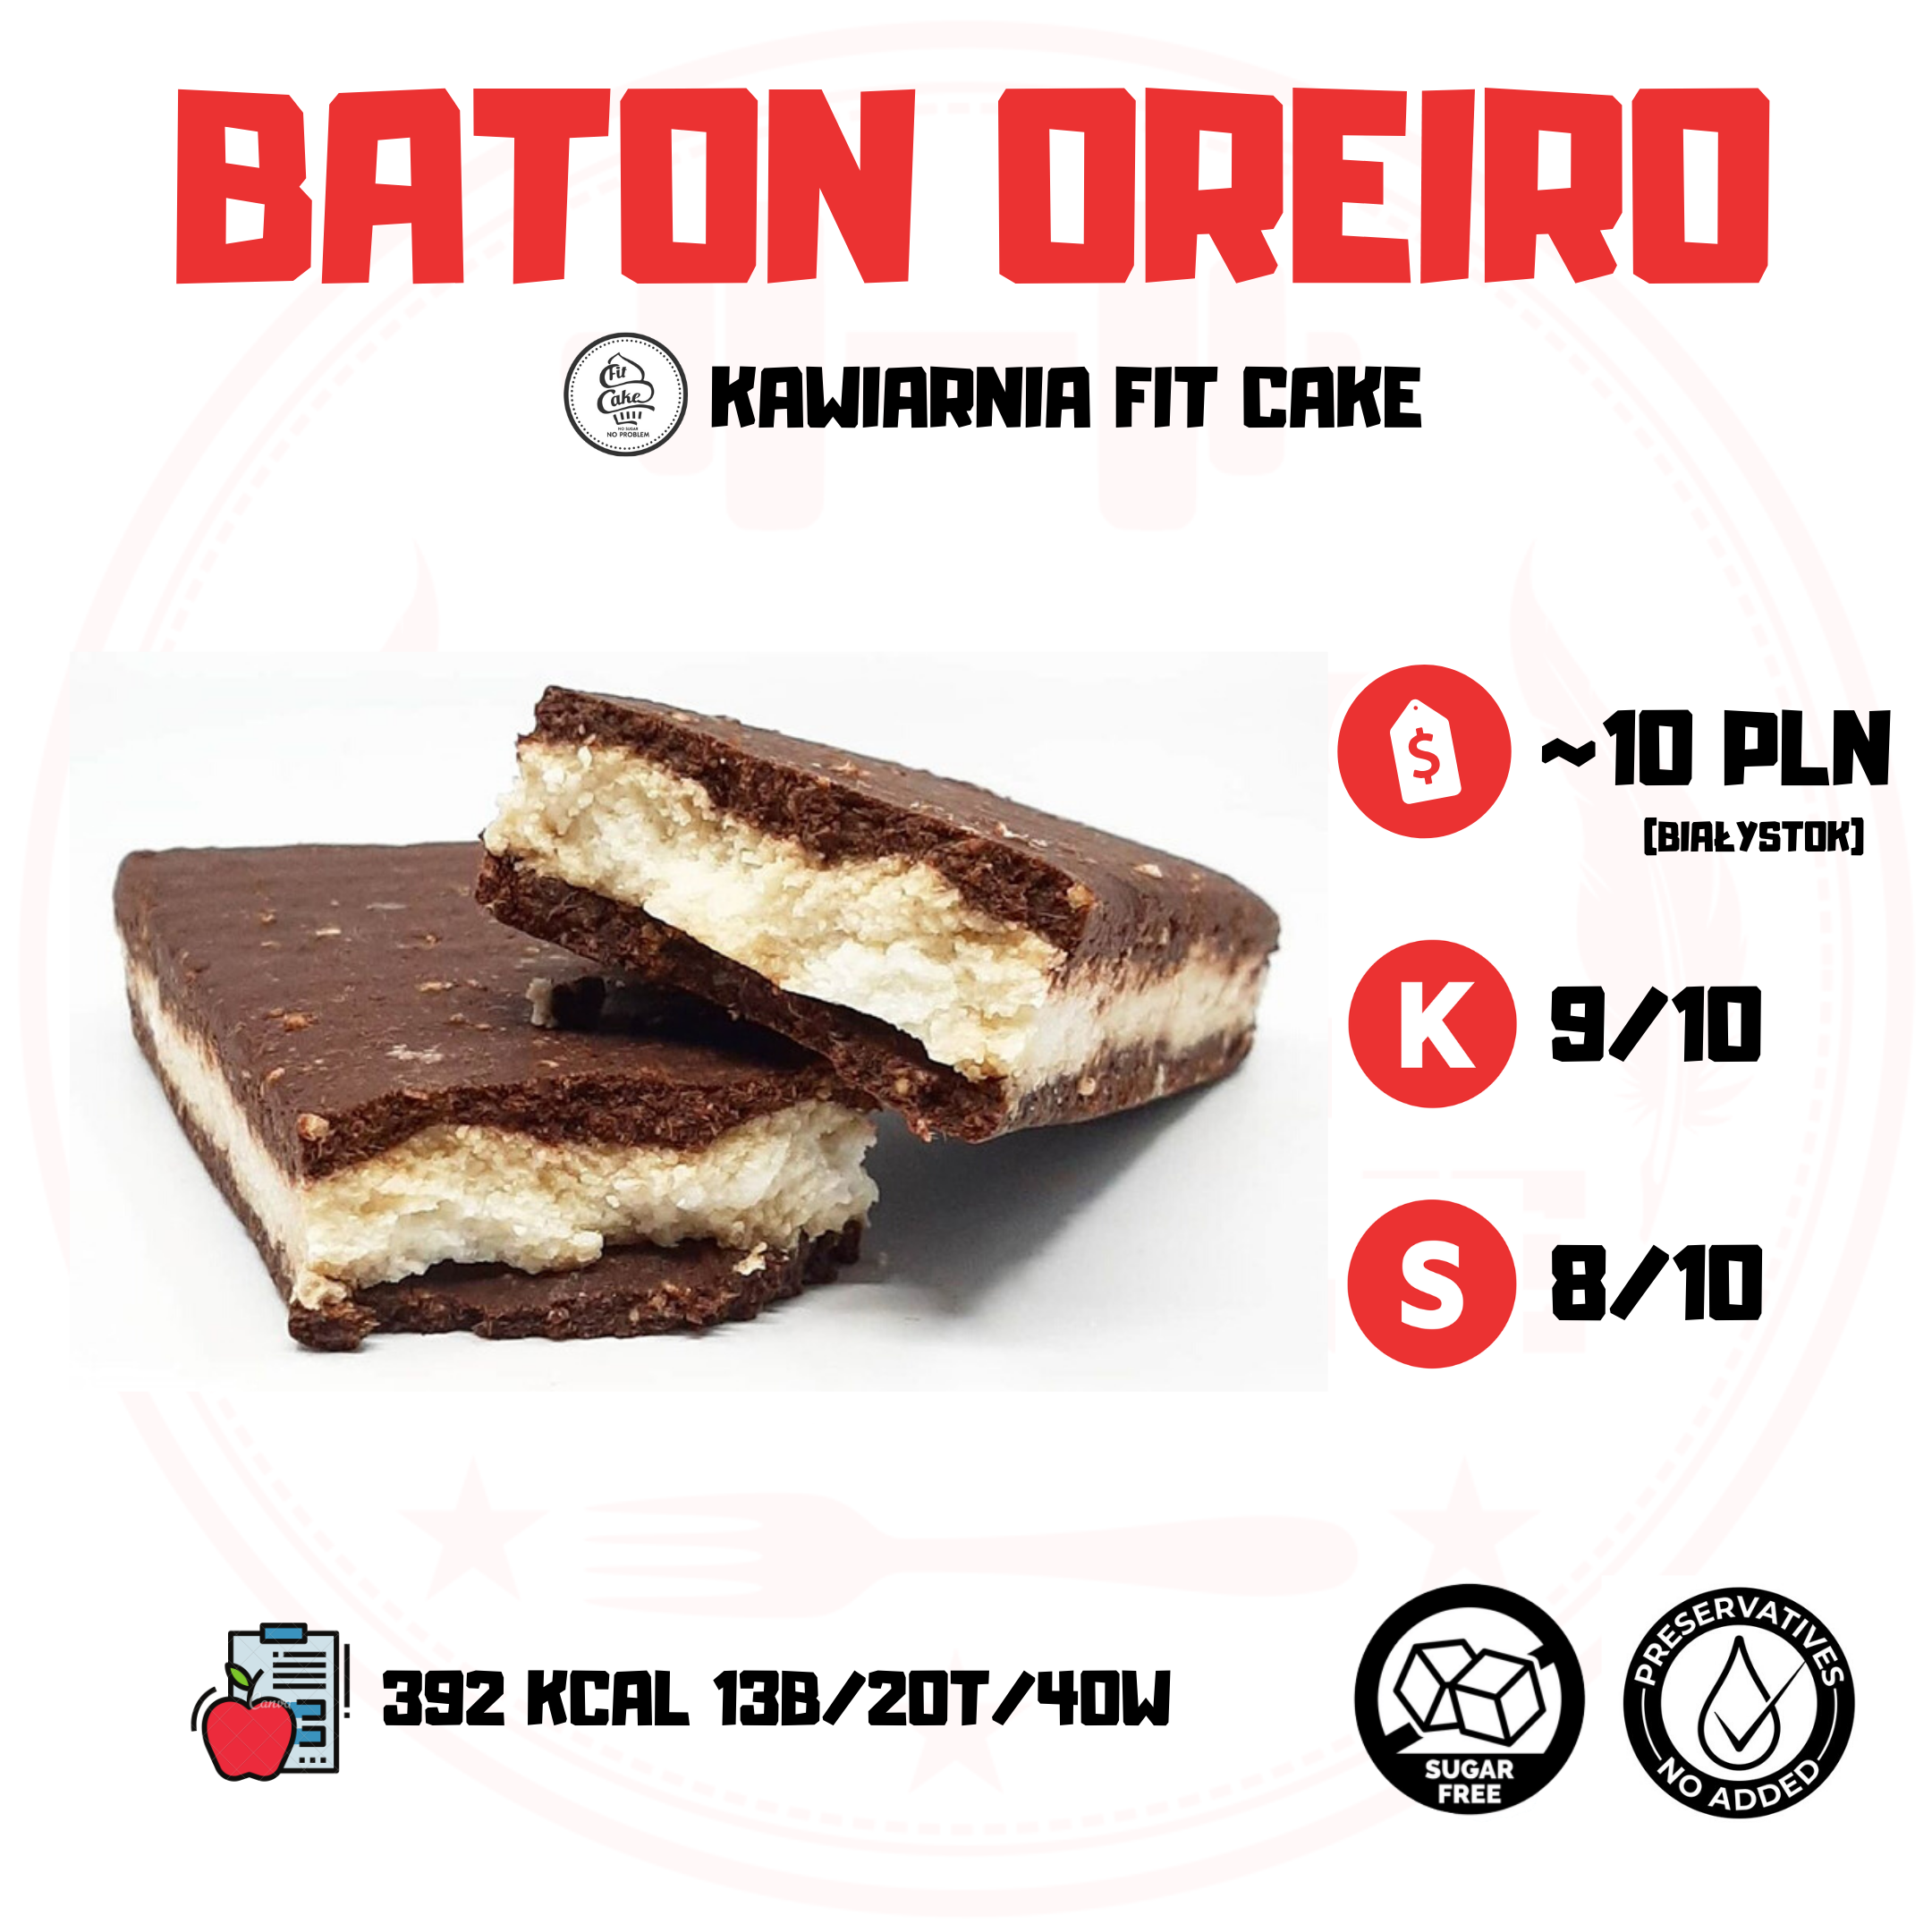 Fit Cake Baton Oreiro – lepszy od ciastek?